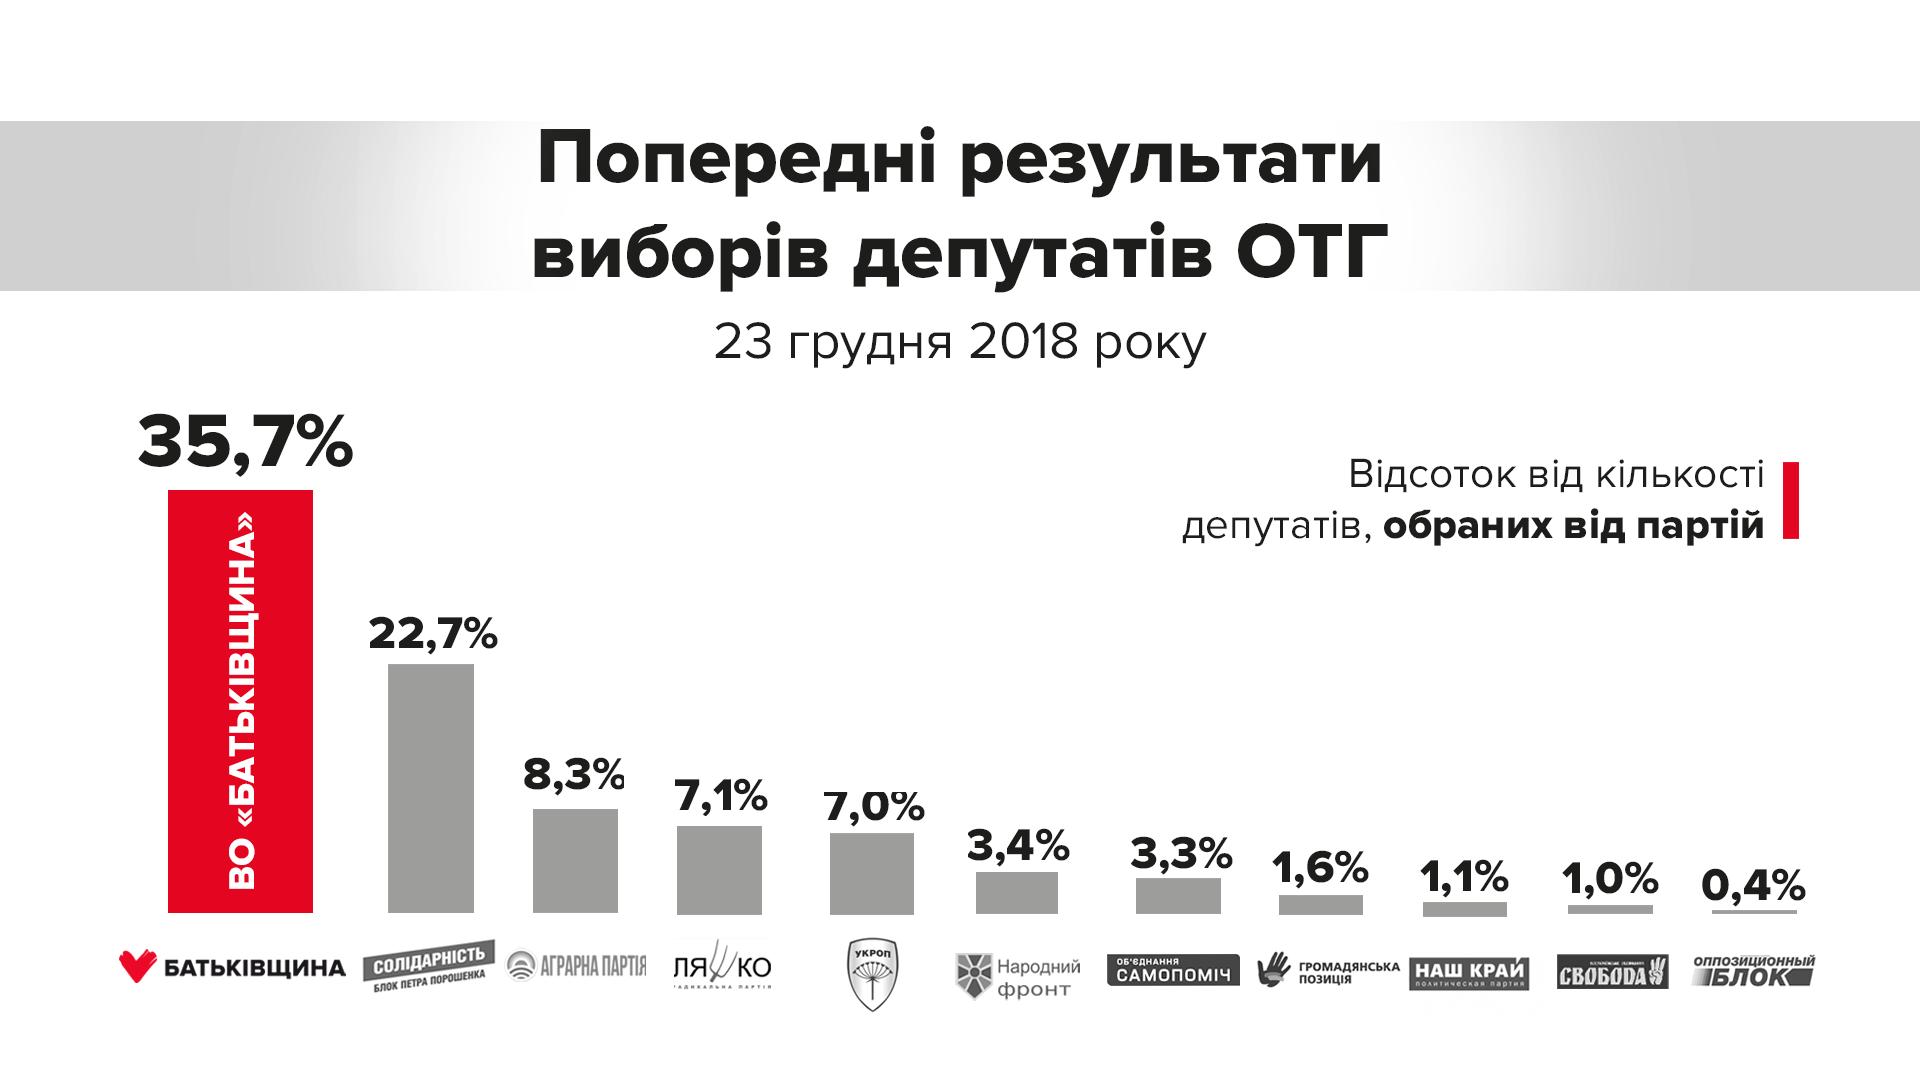 «Батькивщина» одержала безоговорочную победу навыборах вОТО,— Юлия Тимошенко